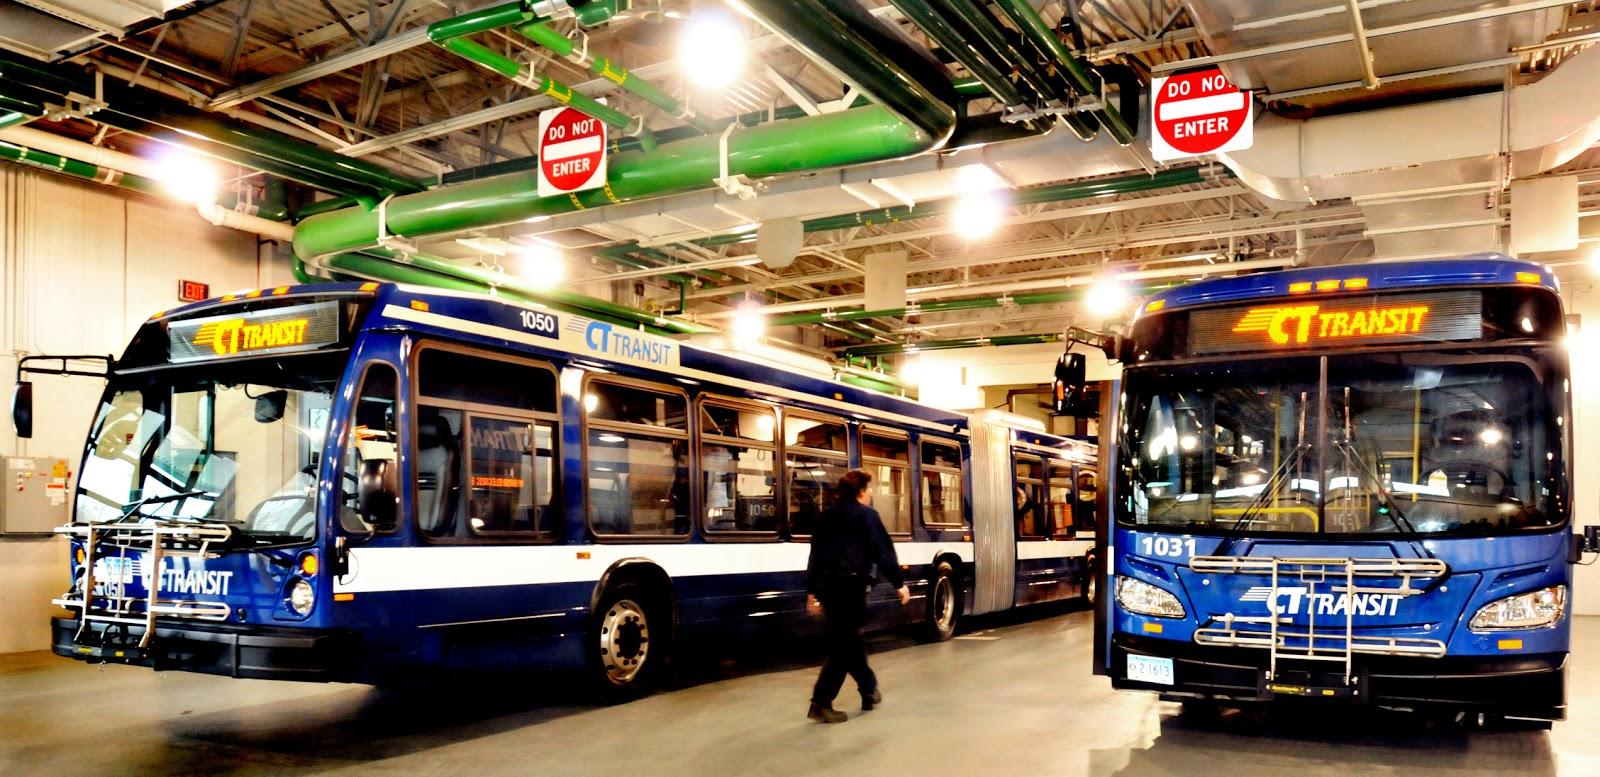 elm city express: 'cttransit to discontinue sargent drive commuter